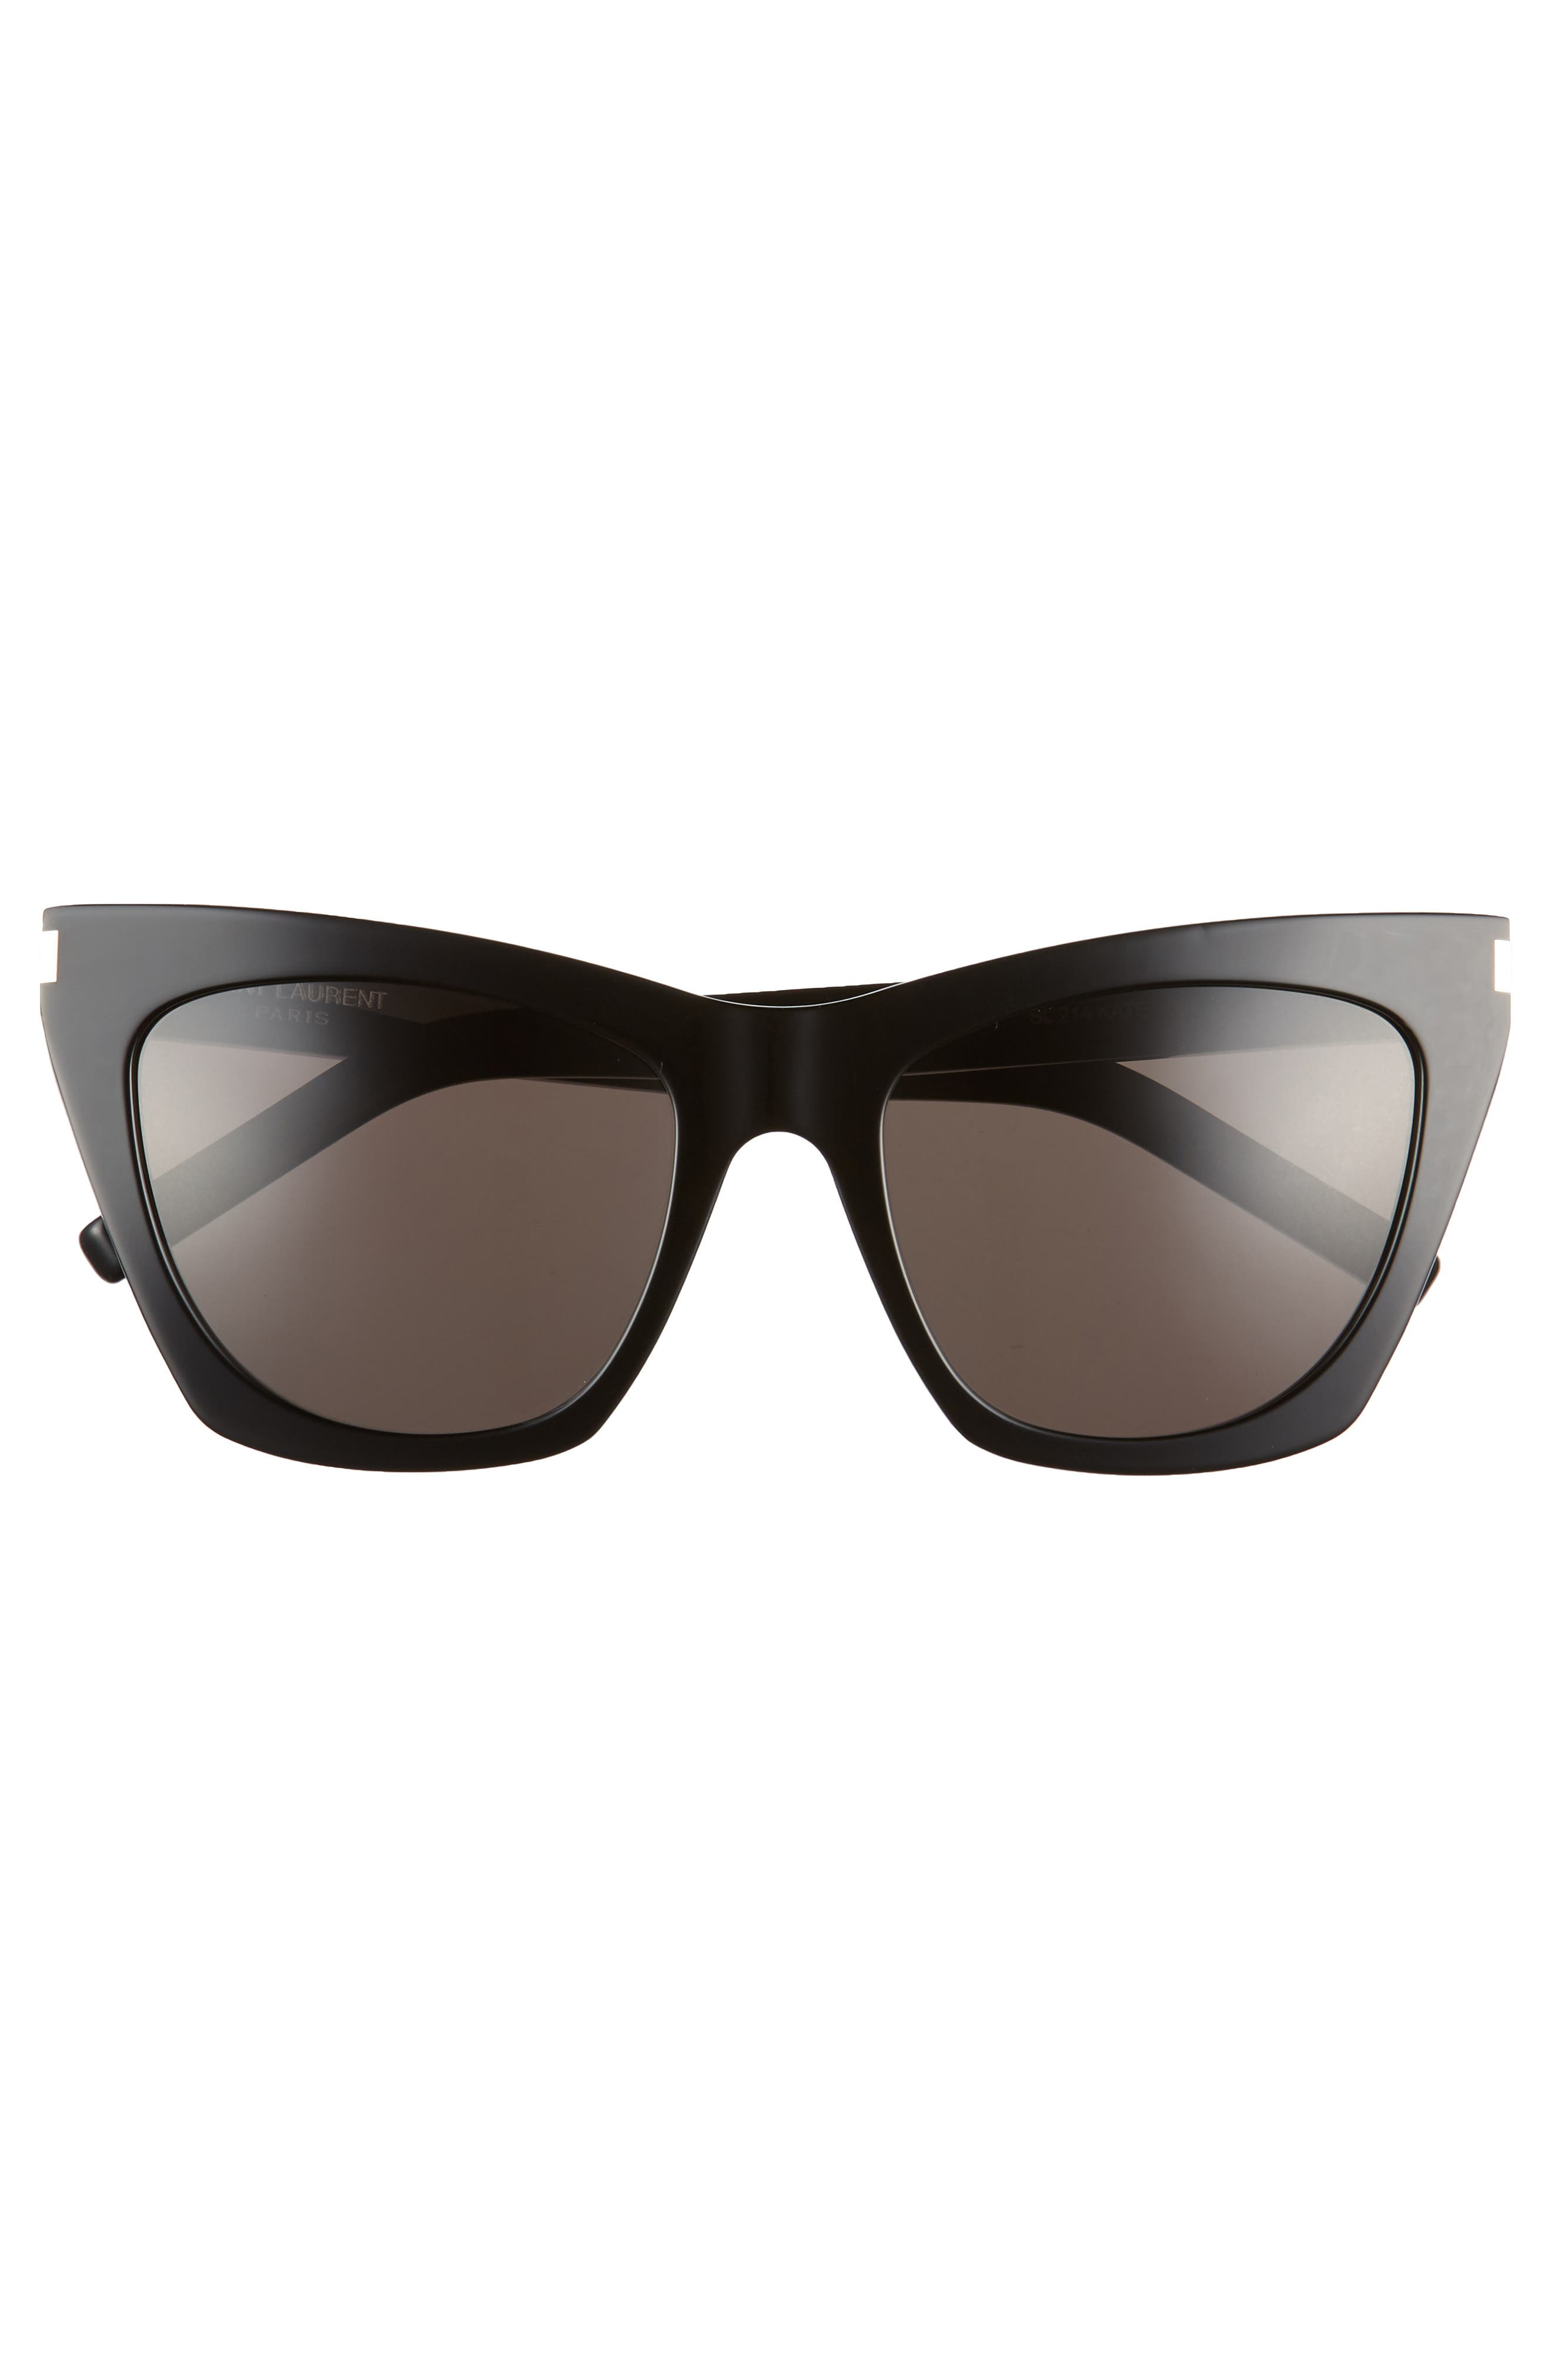 SAINT LAURENT, Kate 55mm Cat Eye Sunglasses, Alternate thumbnail 3, color, BLACK